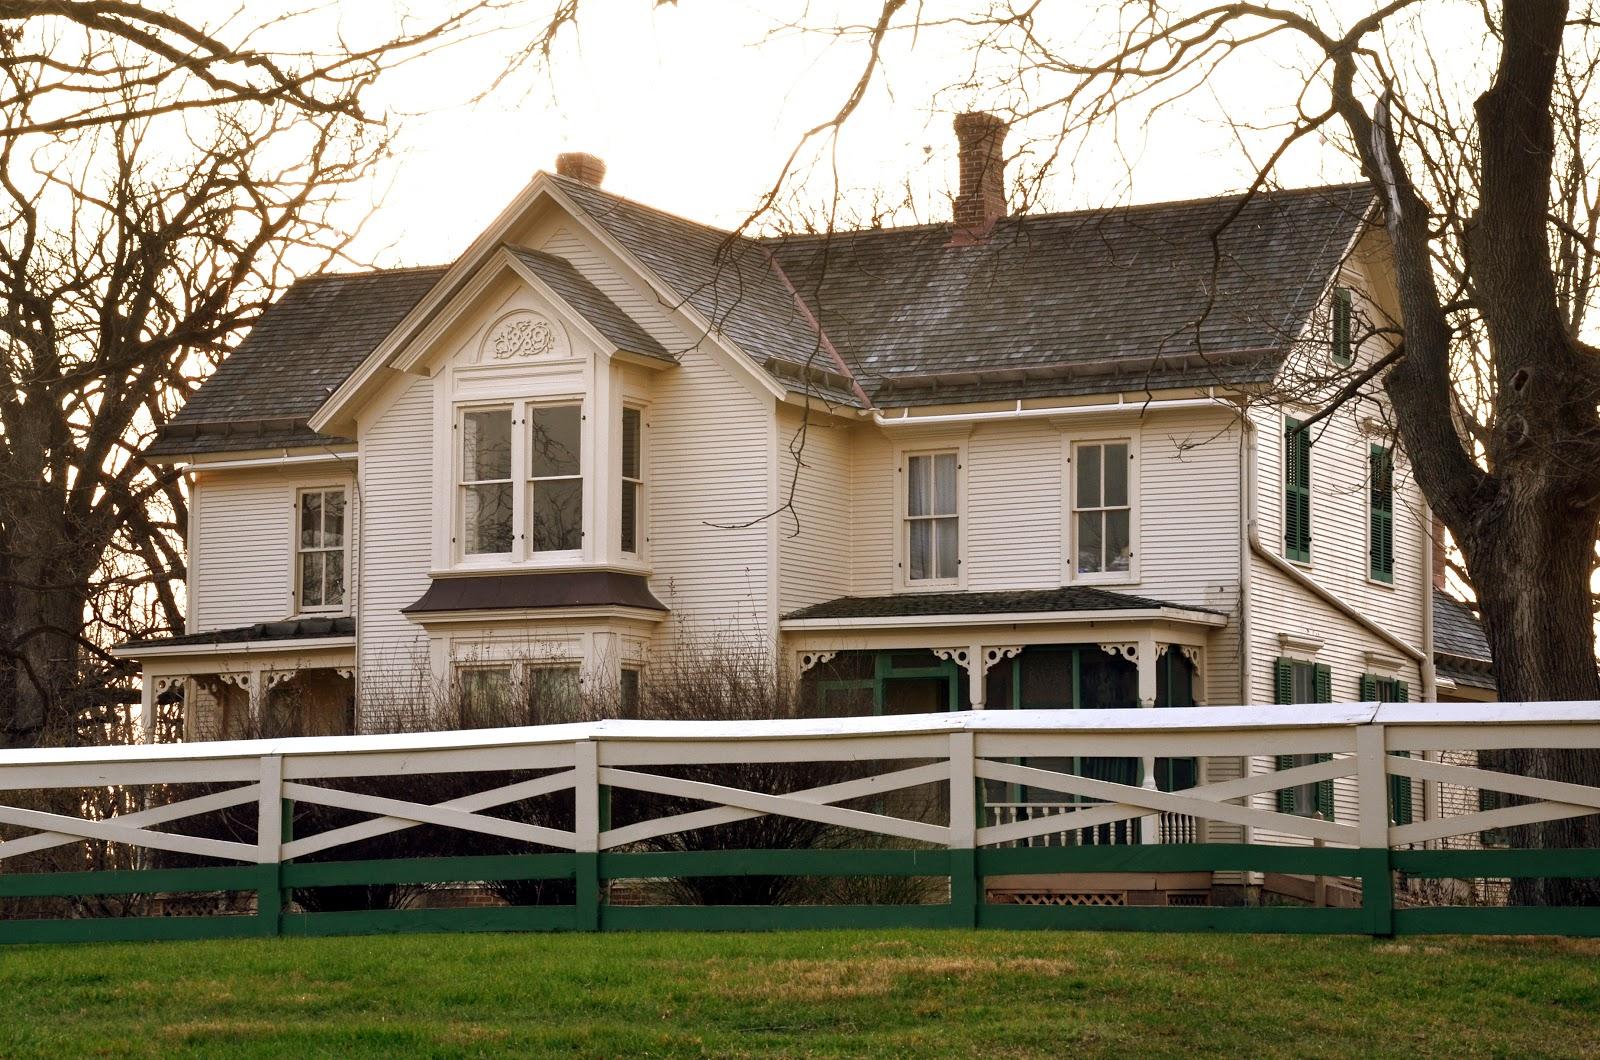 The Digital Research Library of Illinois History Journal™ Kline Creek Farm